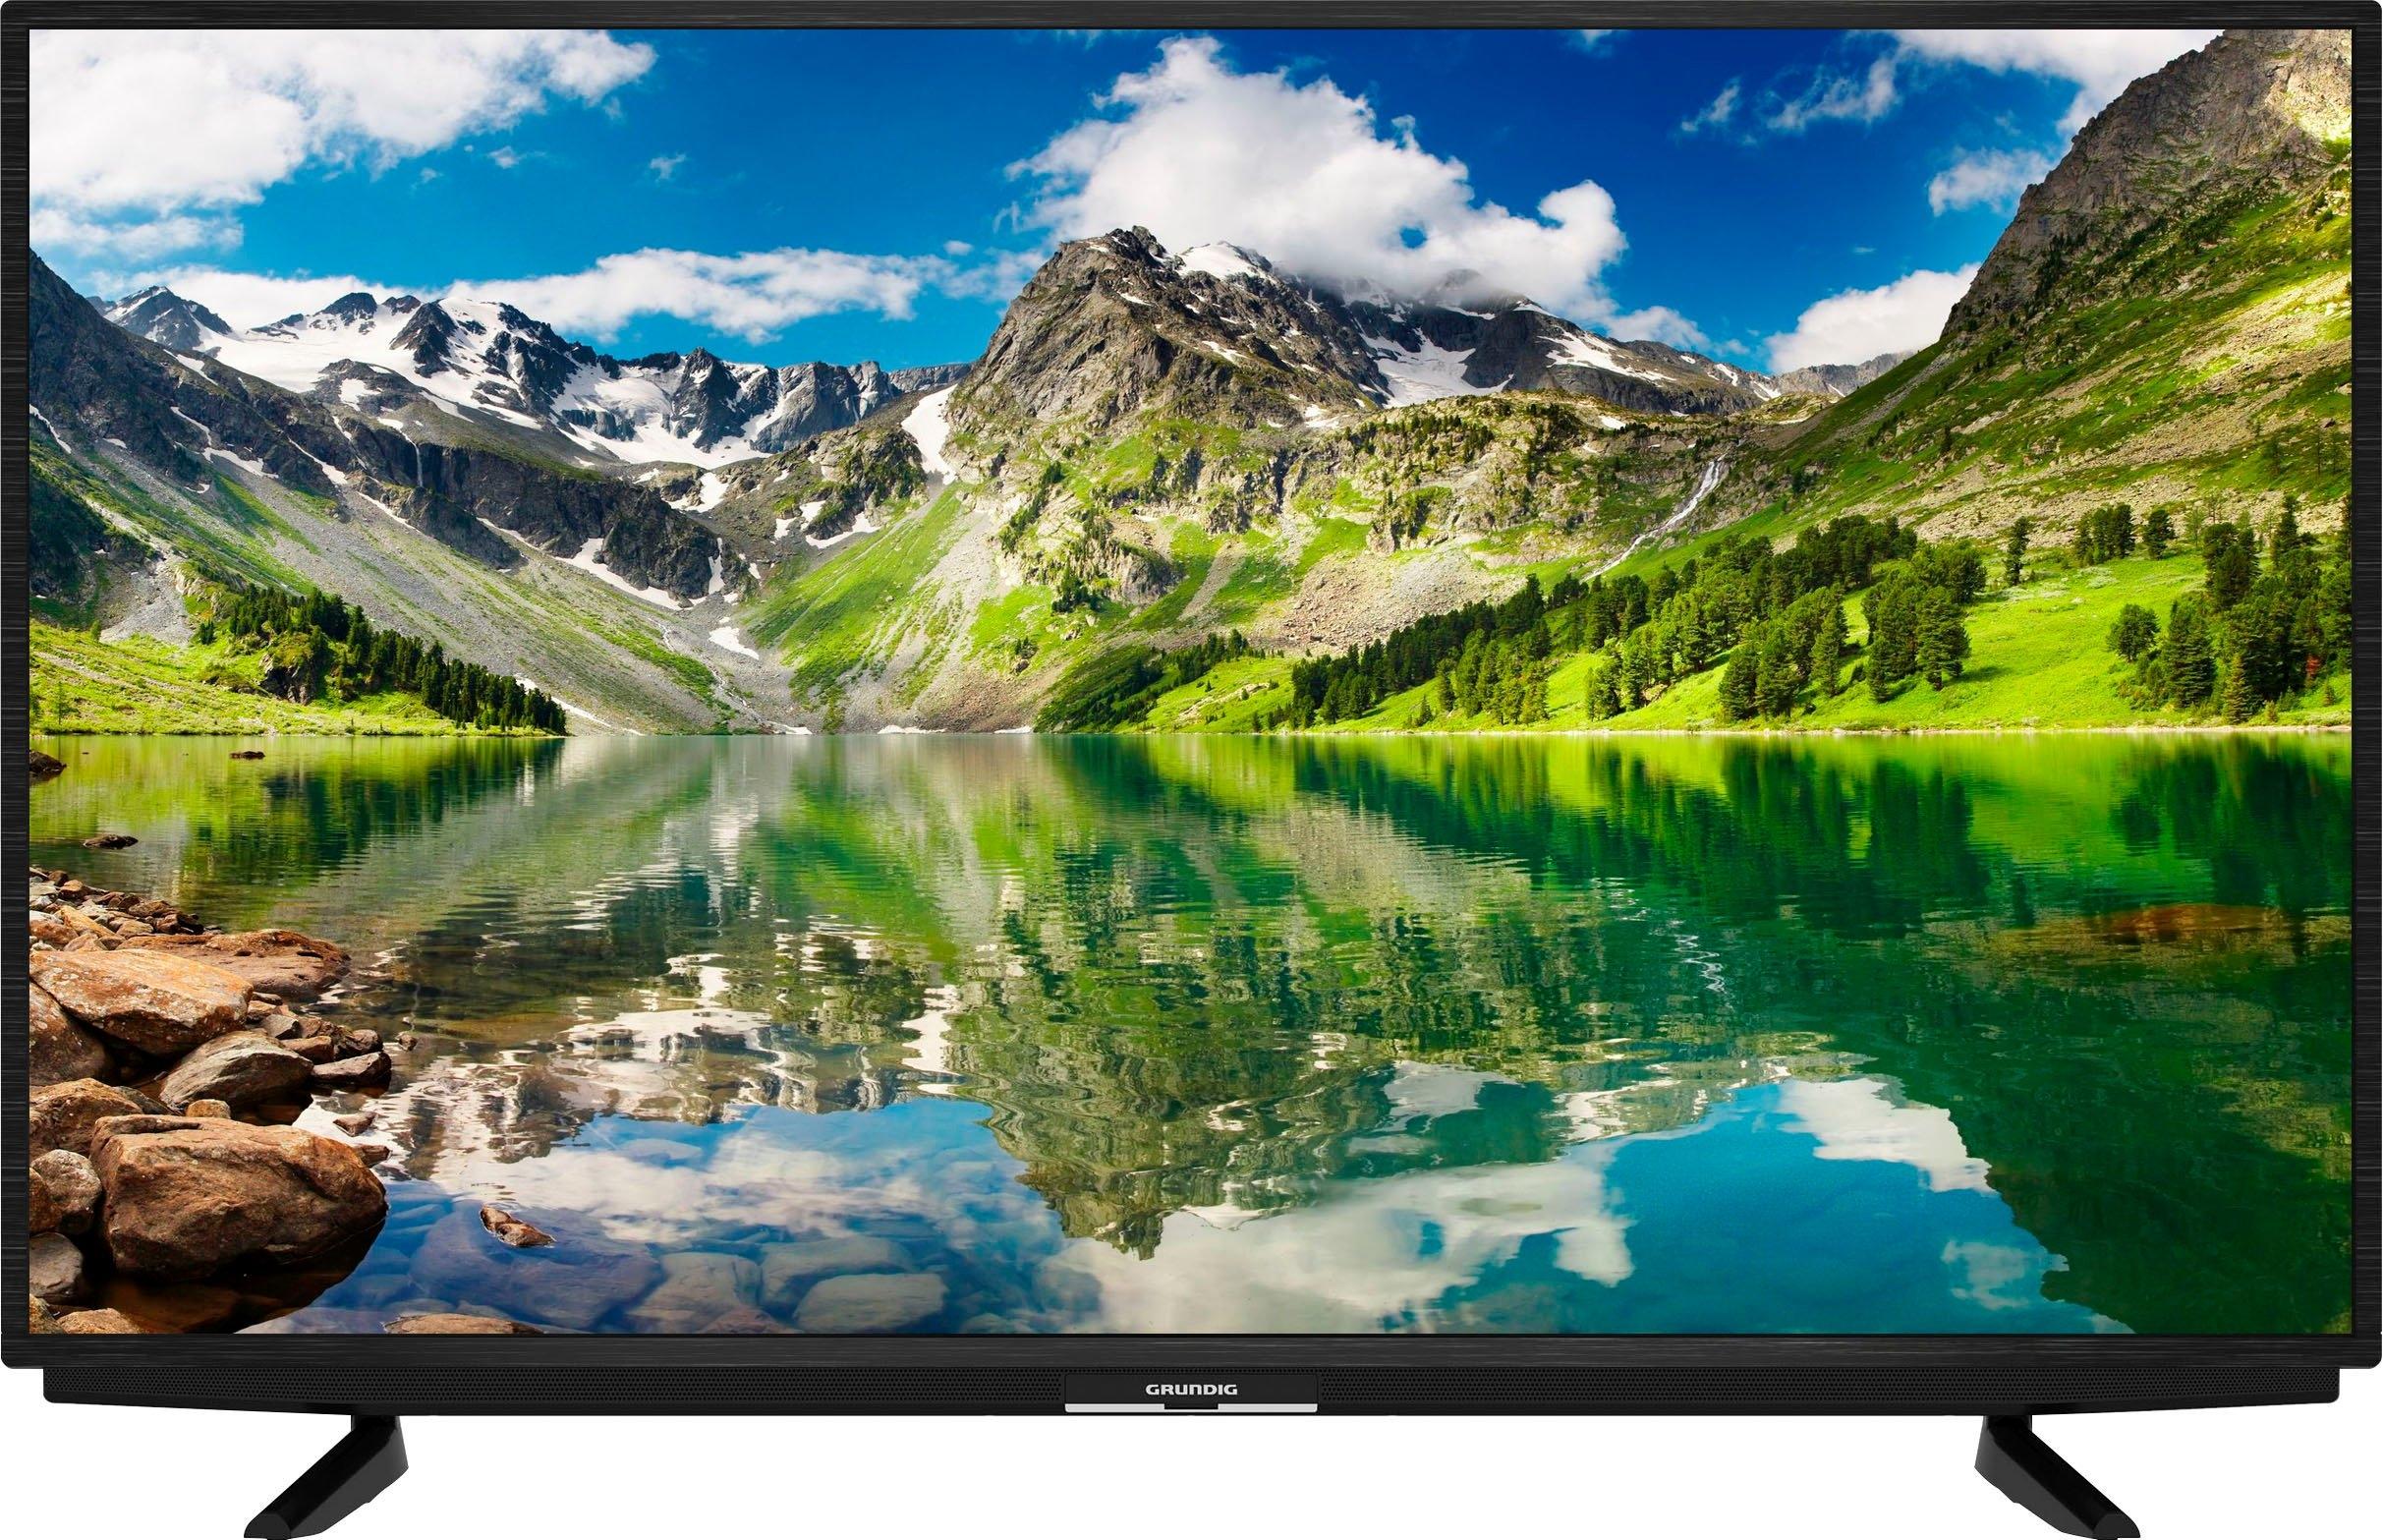 Grundig »43 VOE 71 - Fire TV Edition« LED-TV nu online bestellen